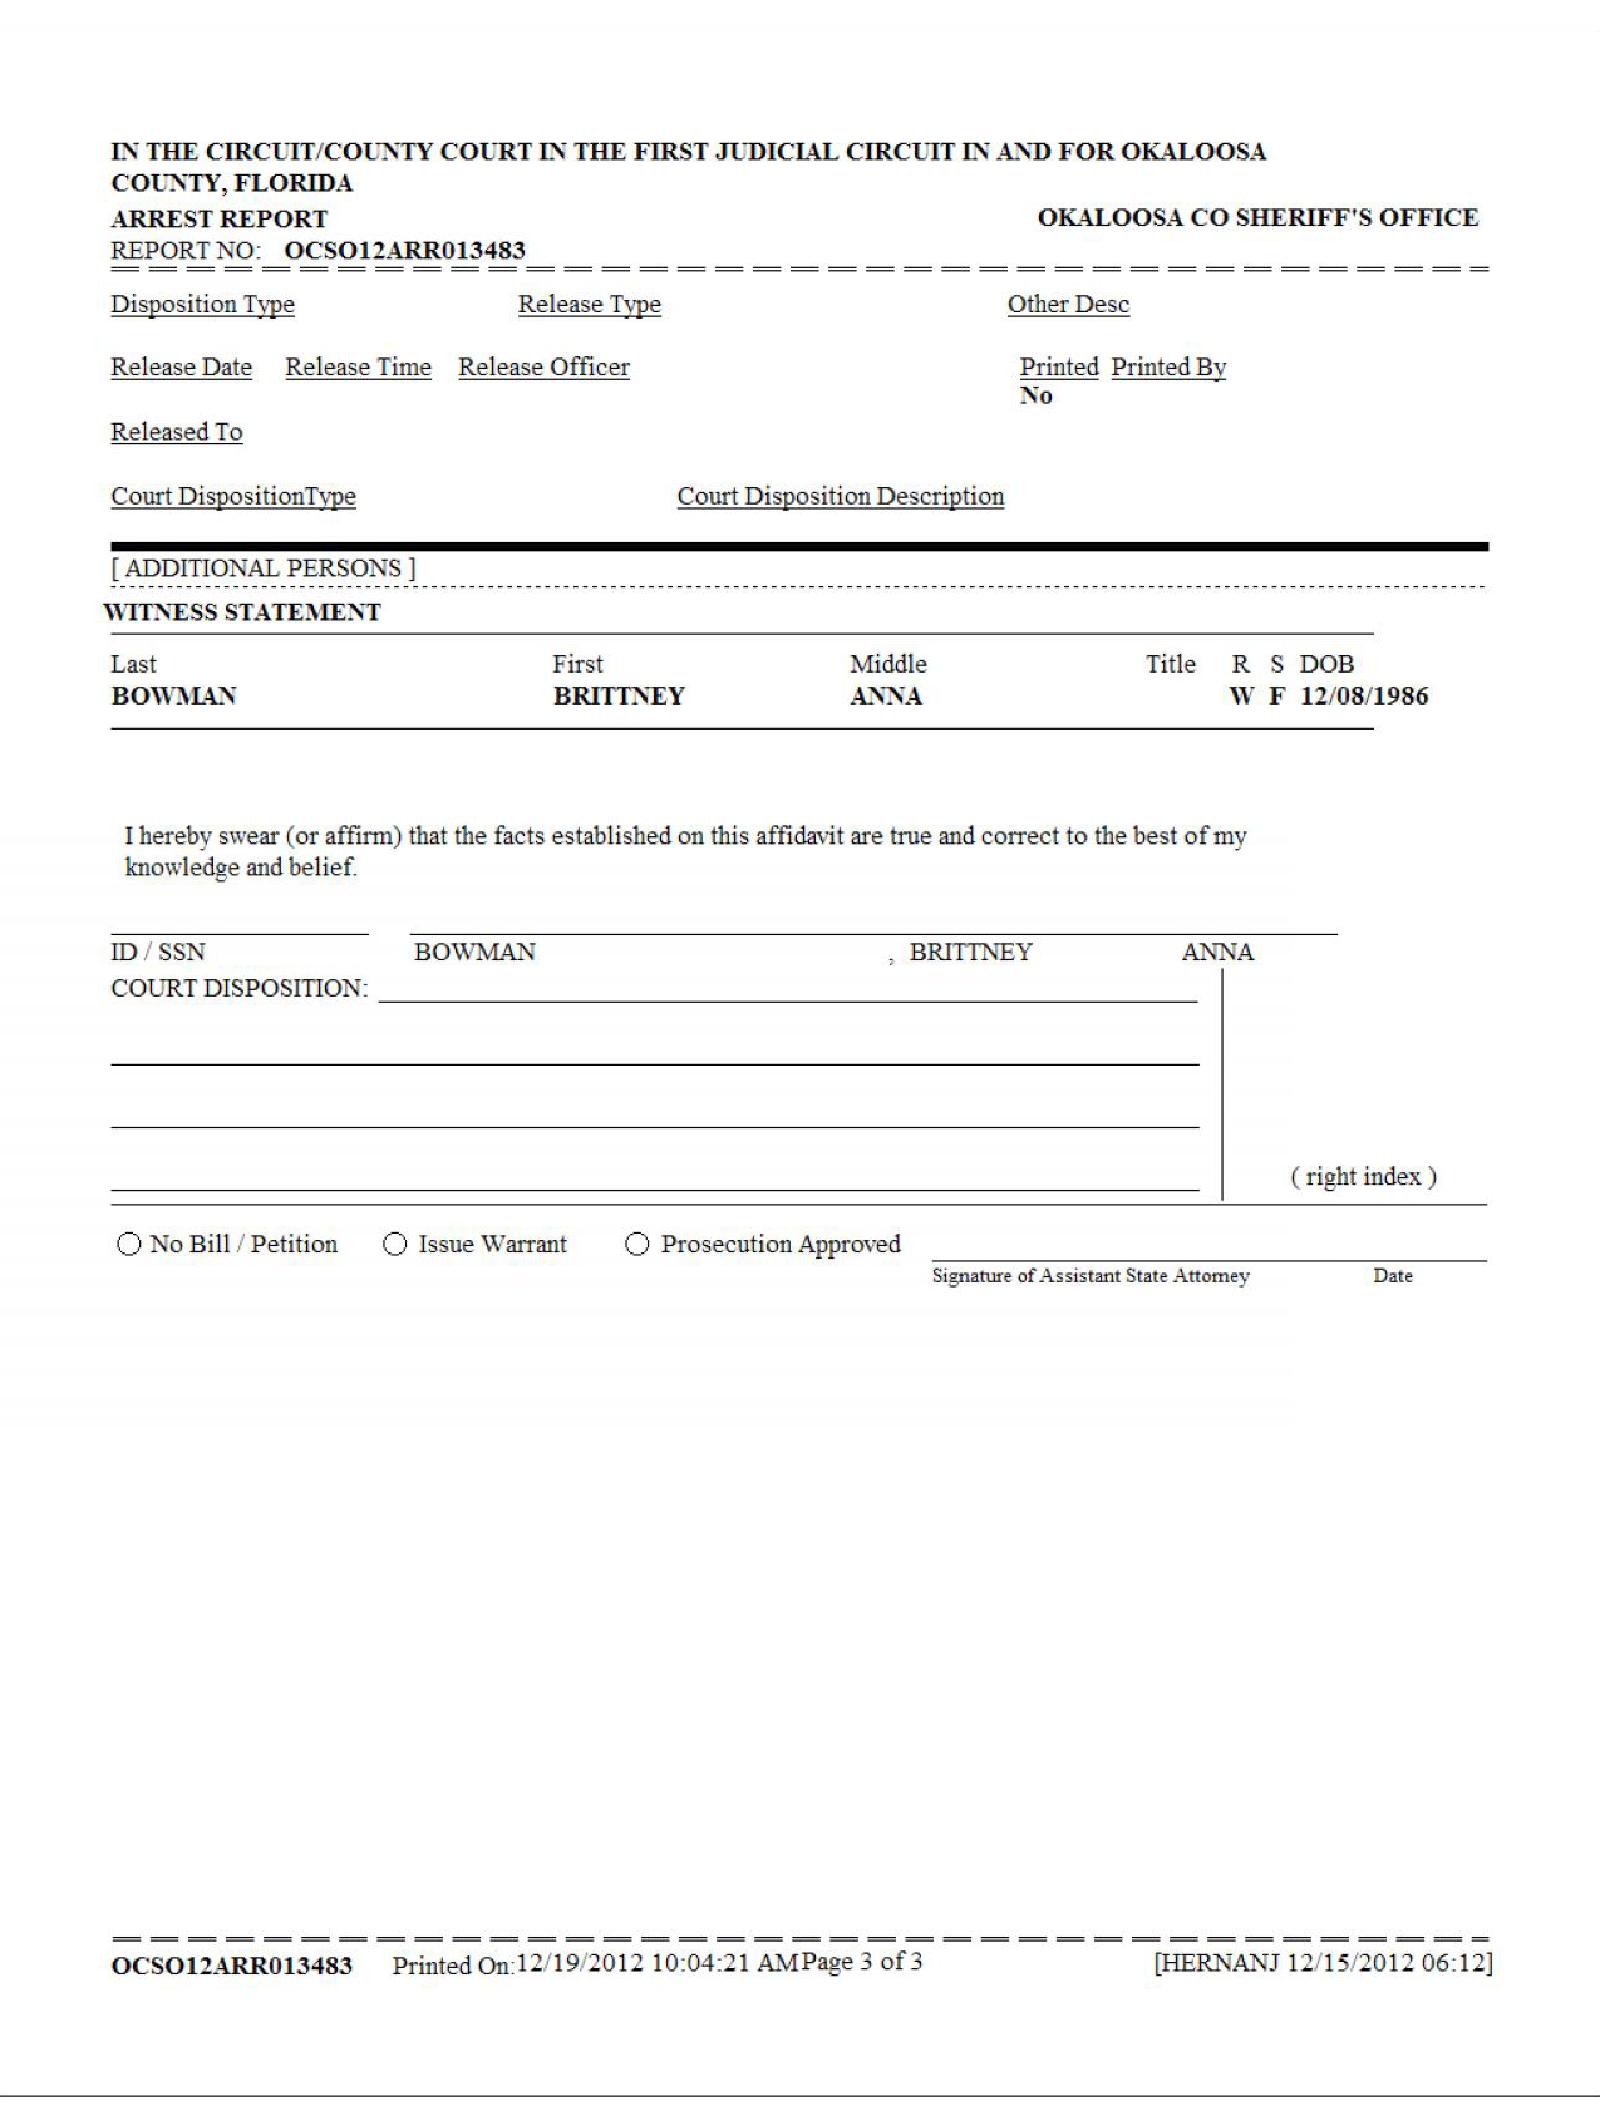 Copy of bowman brittne arrest report6.png